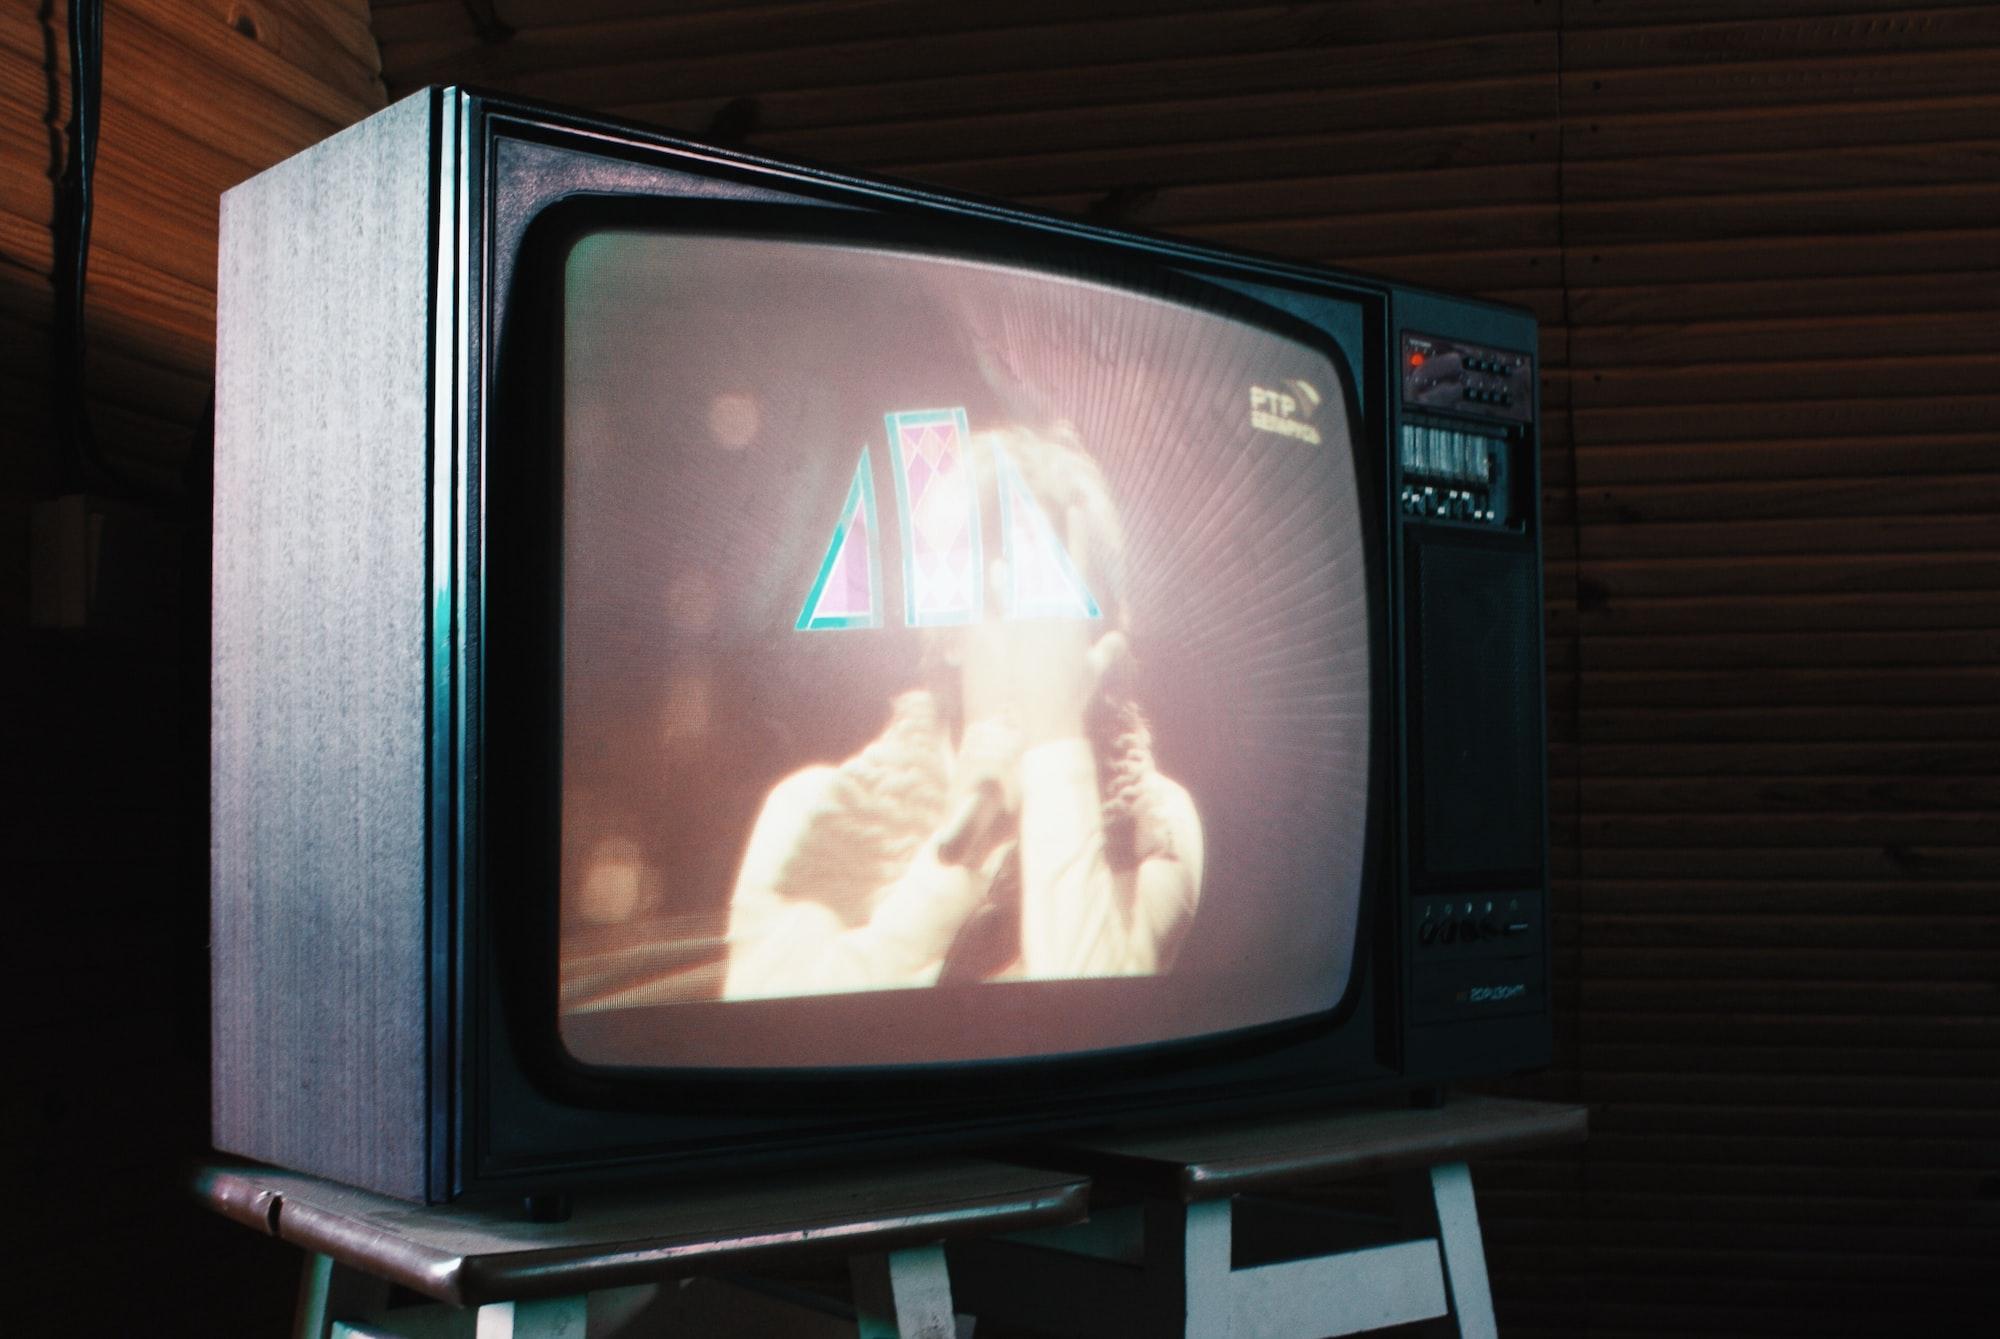 iFeed Talks - Qual o rumo do Apple TV+ no mercado do streaming de vídeo?